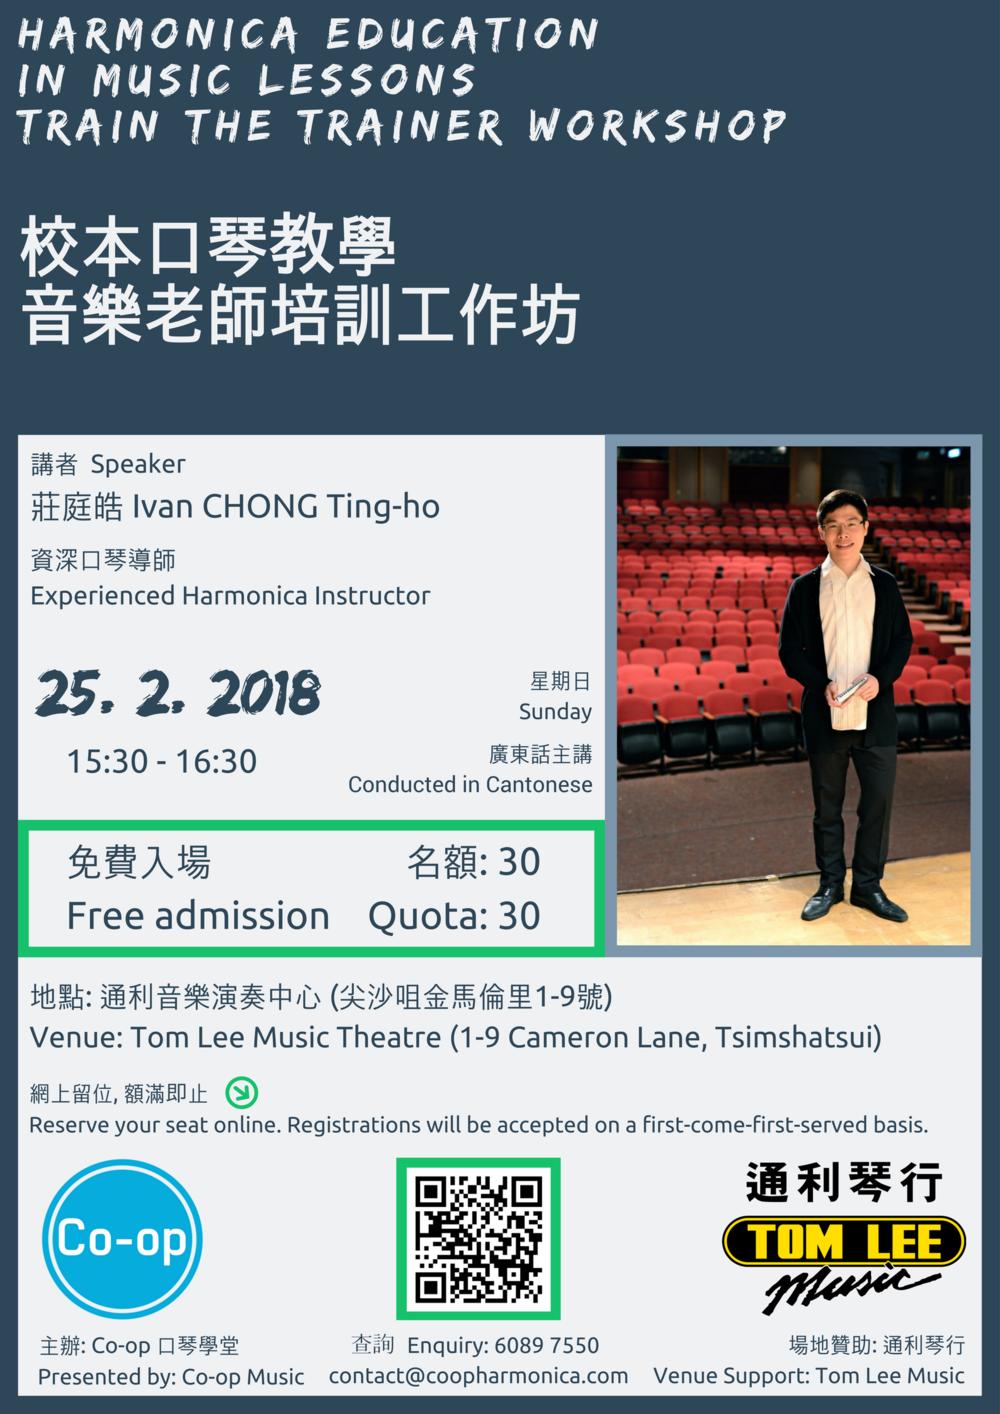 Harmonica Education - Train the Trainer Workshop - 25 Feb 2018.png